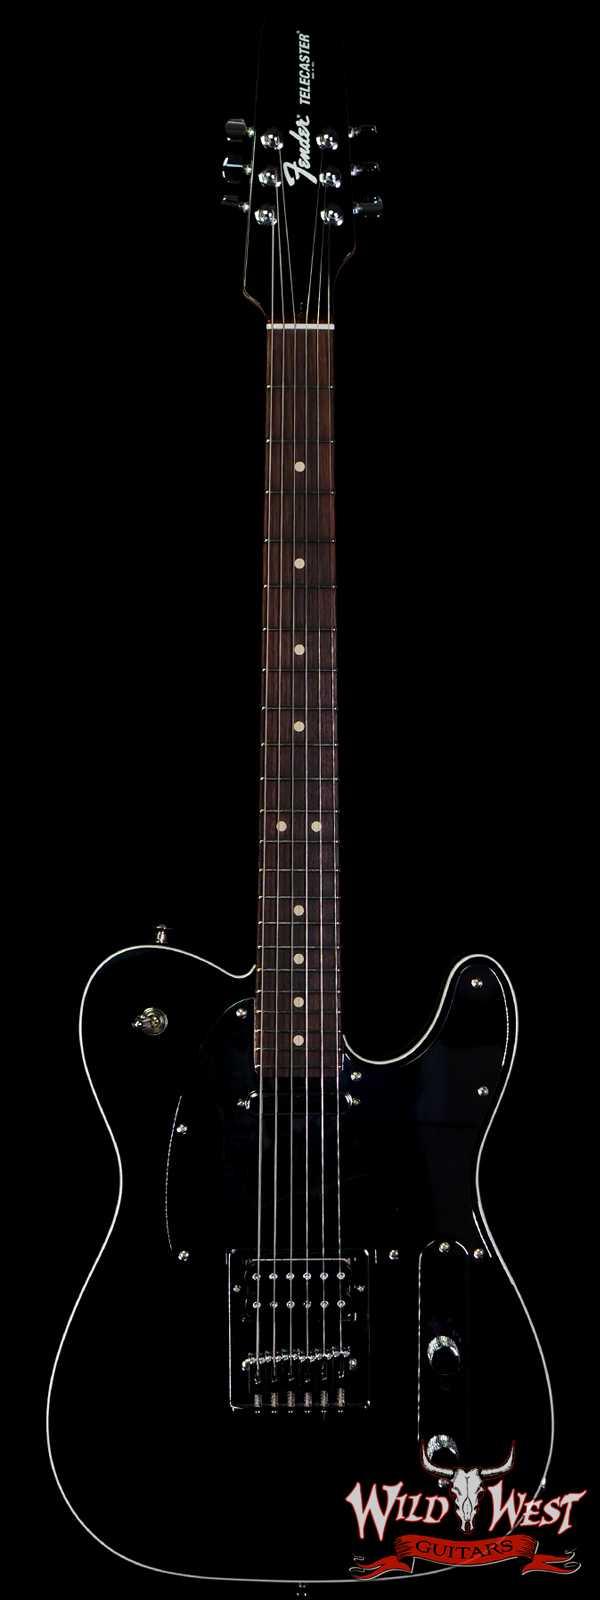 John⑤ Fender Custom Shop John 5 Signature SH Telecaster Rosewood Fretboard Black